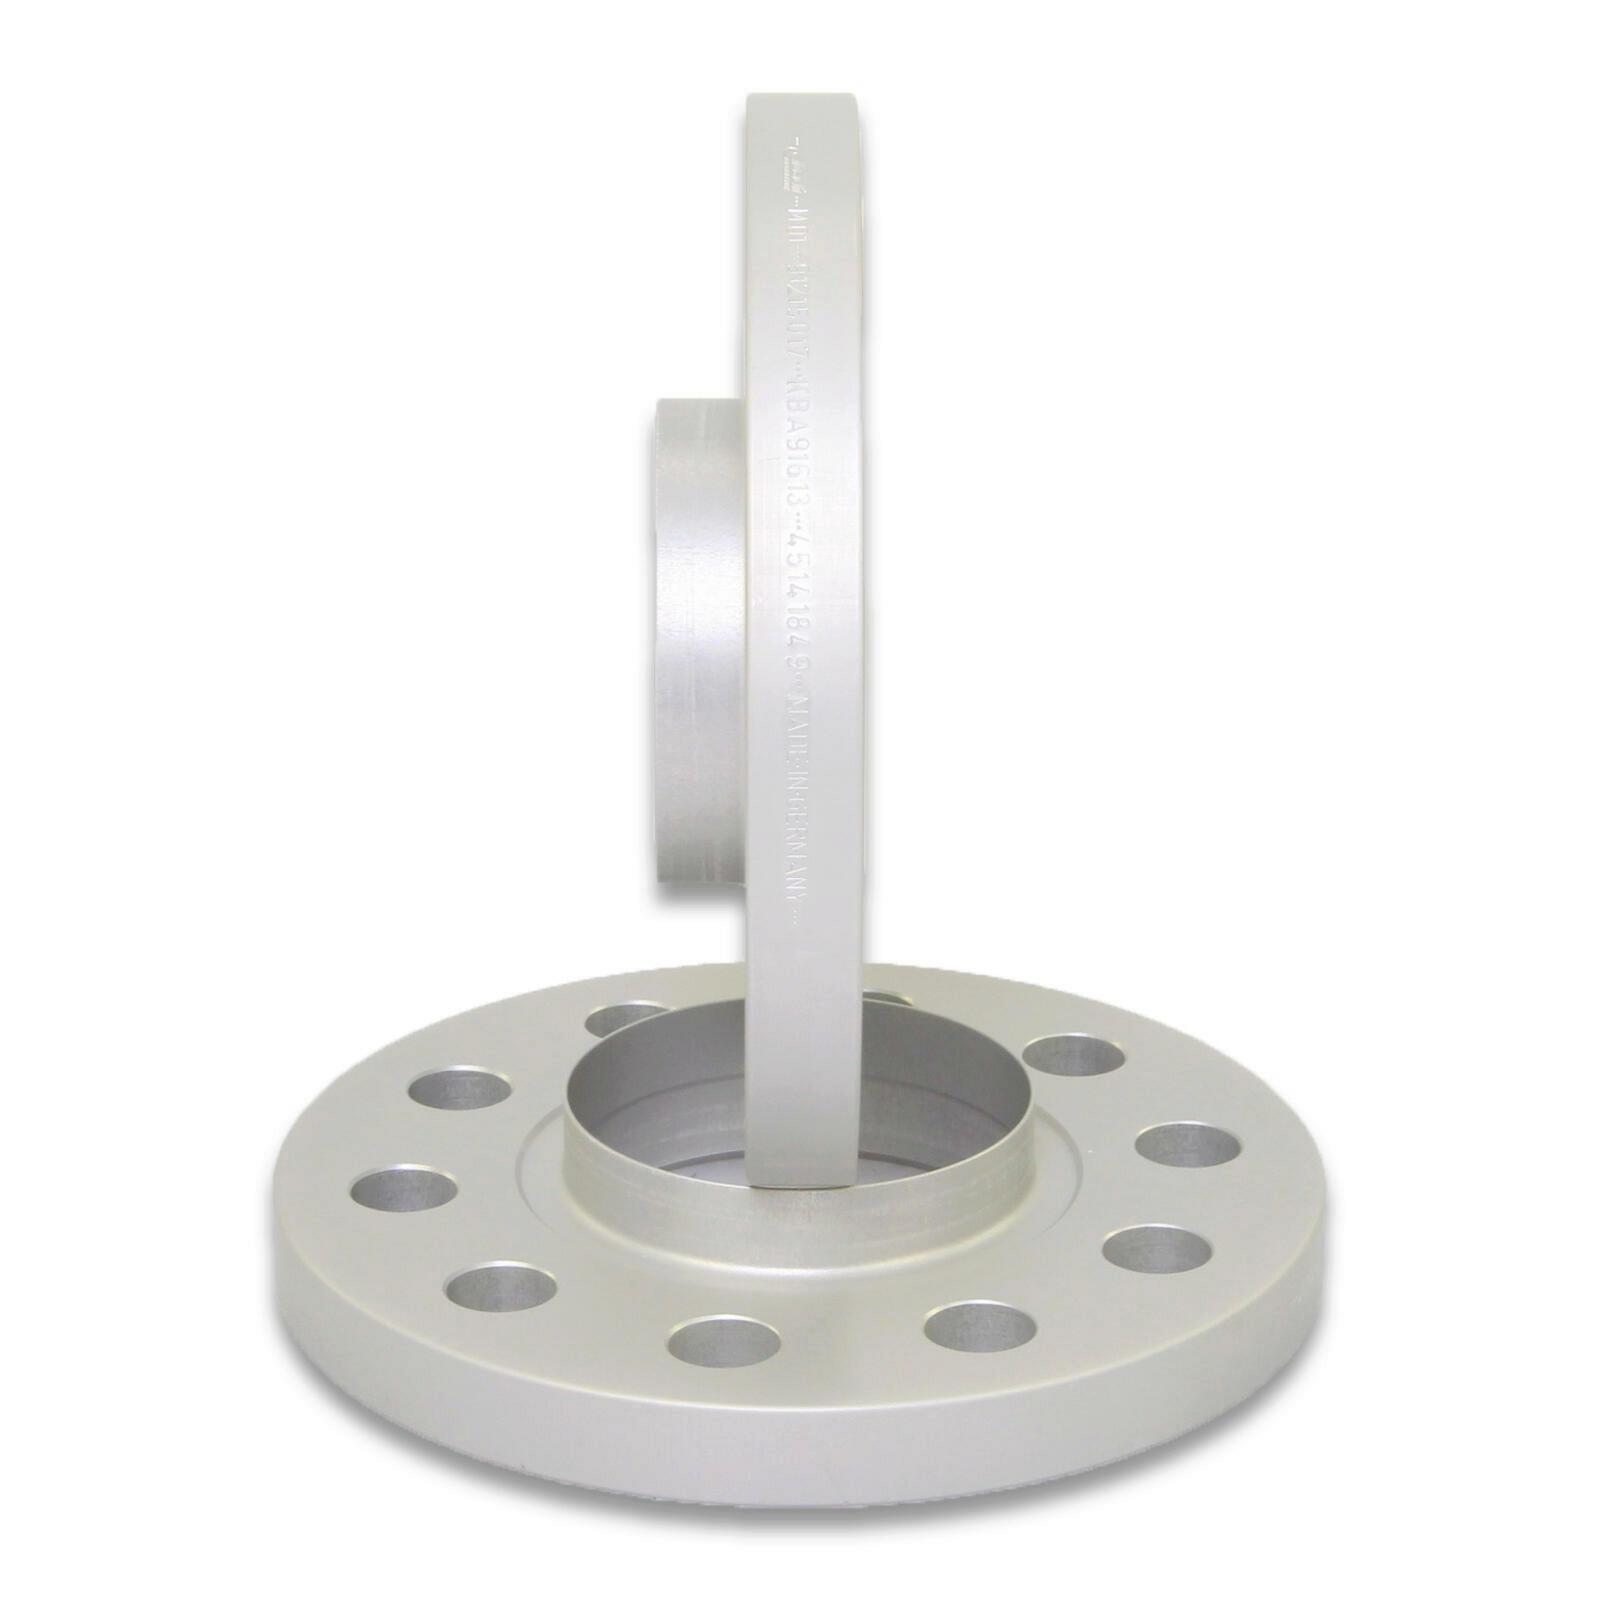 EIBACH Spurplatten Spurverbreiterung Distanzscheibe Ø66,45 5x112 30mm // 2x15mm